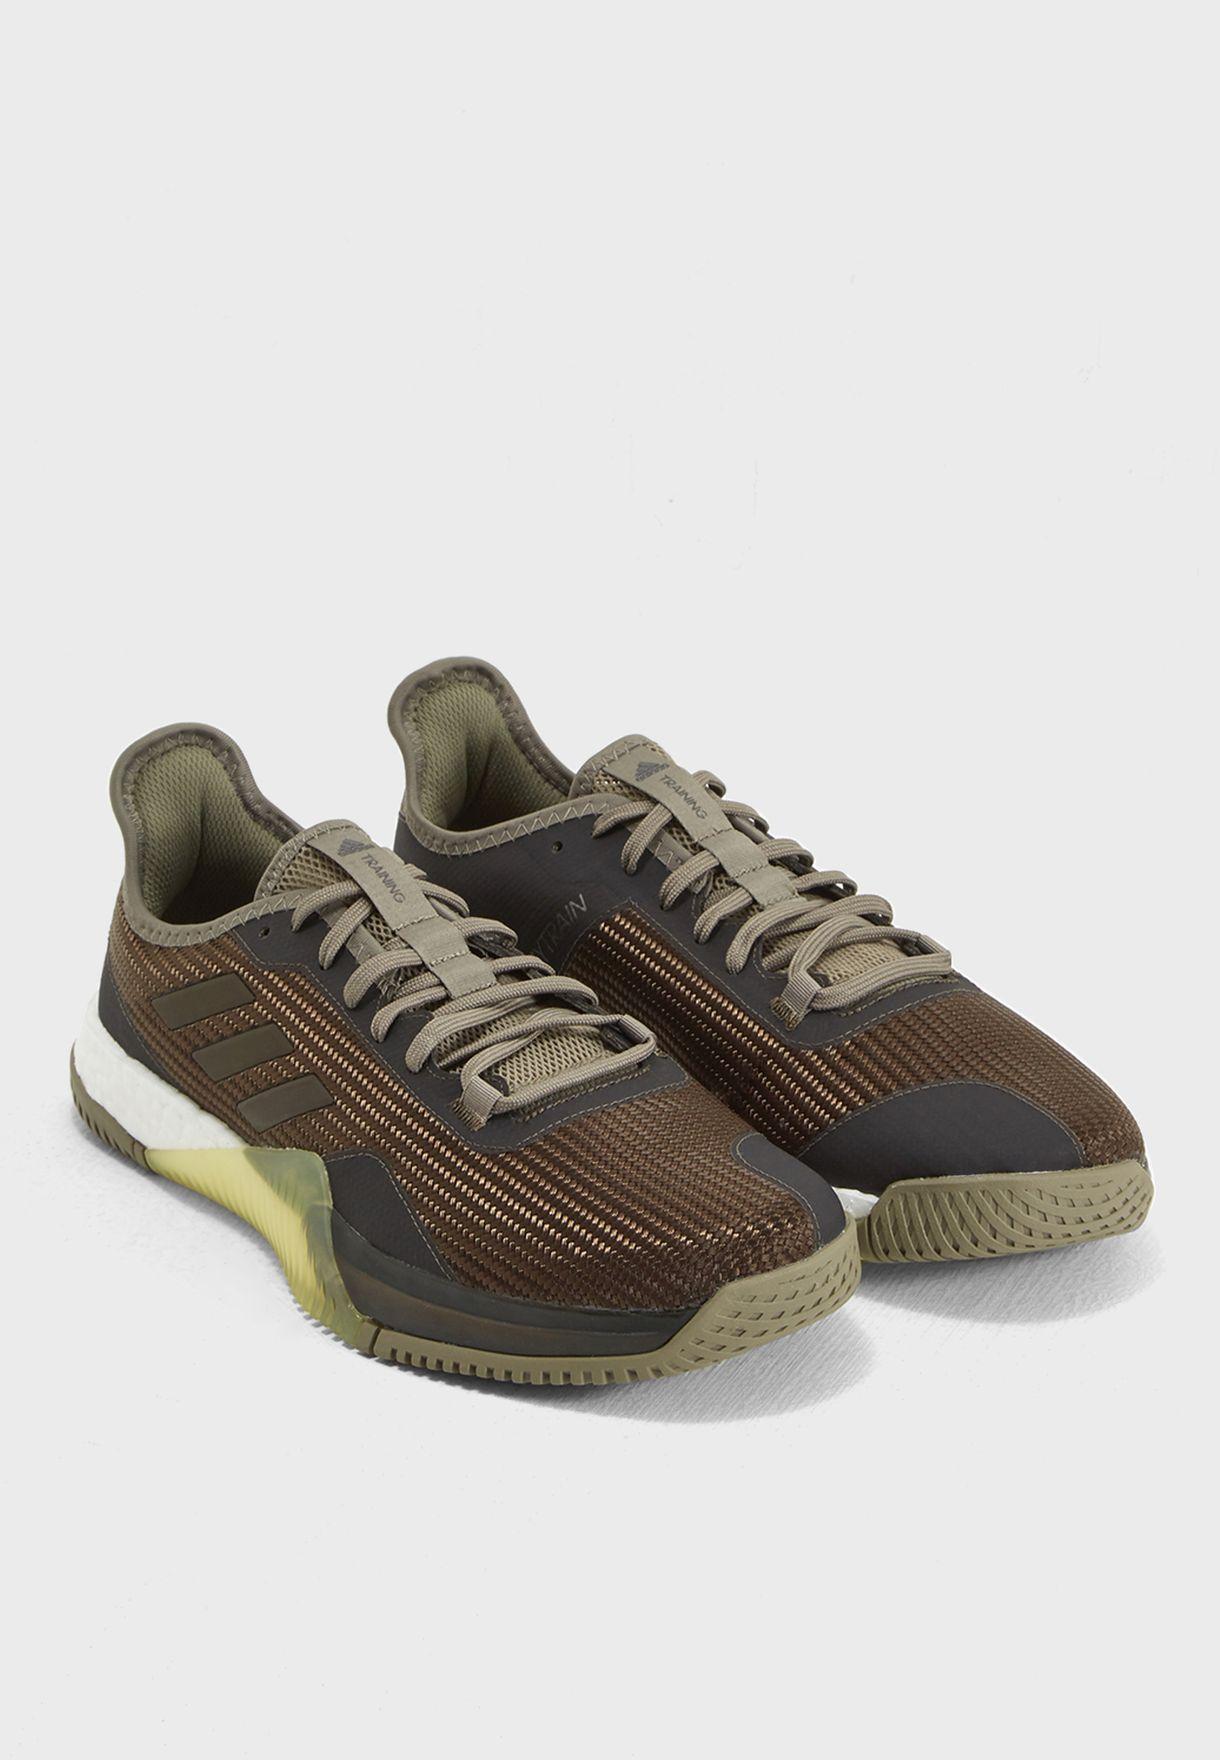 competitive price 04859 6784b ... adidas Mens Crazytrain Elite M Gymnastics Shoes, (Core BlackNight  7325d78 Met), d0f812d7 adidas. 57a4c15 Crazytrain Elite 767c4f4e ...